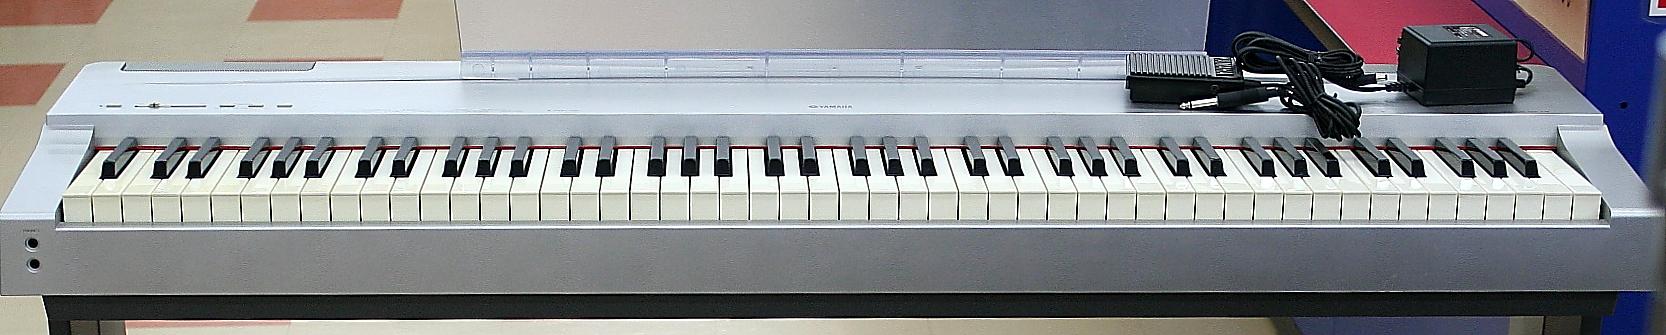 YAMAHA 電子ピアノ P-70S